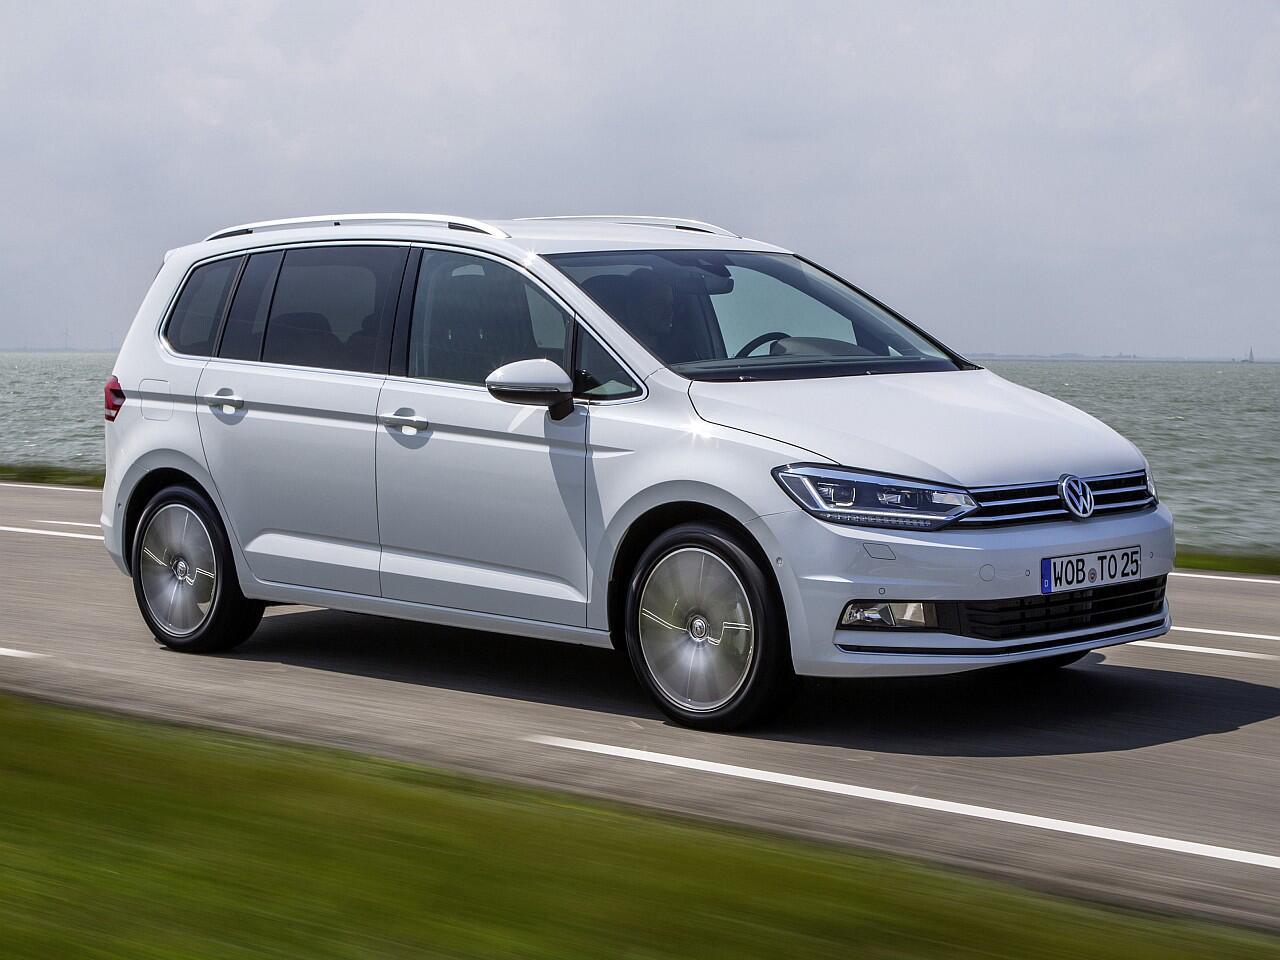 Bild zu Grossraum-Vans: VW Touran